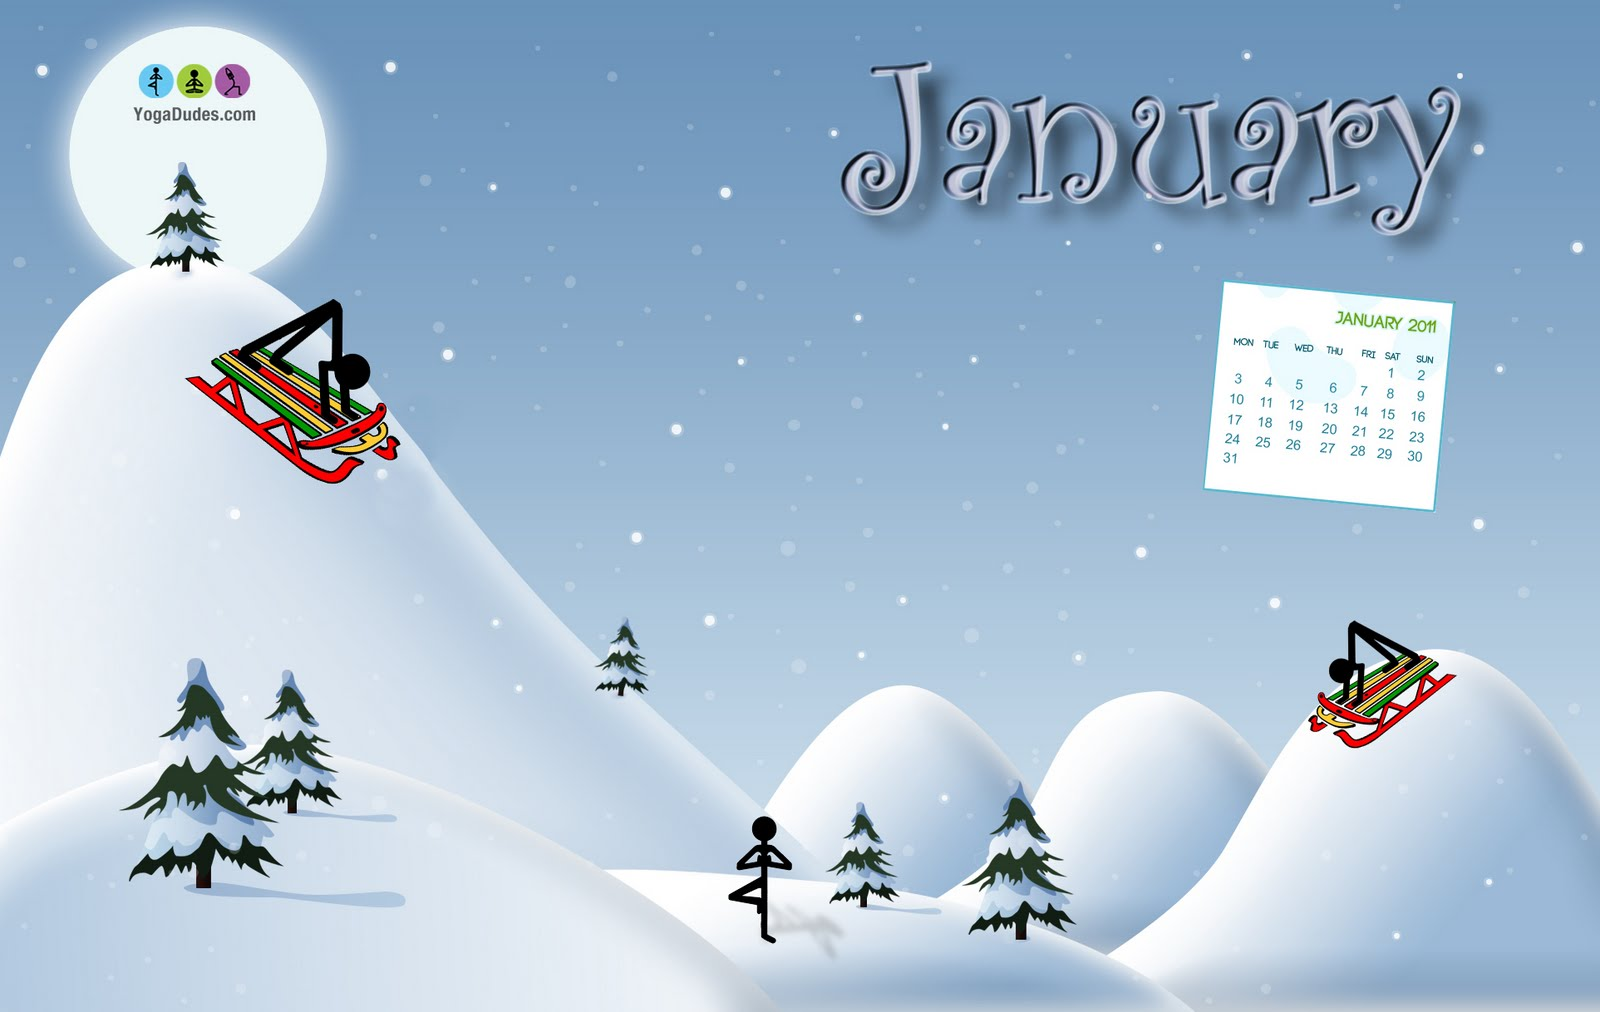 Free Calendar Wallpaper January : Yogadudes free january desktop calendar